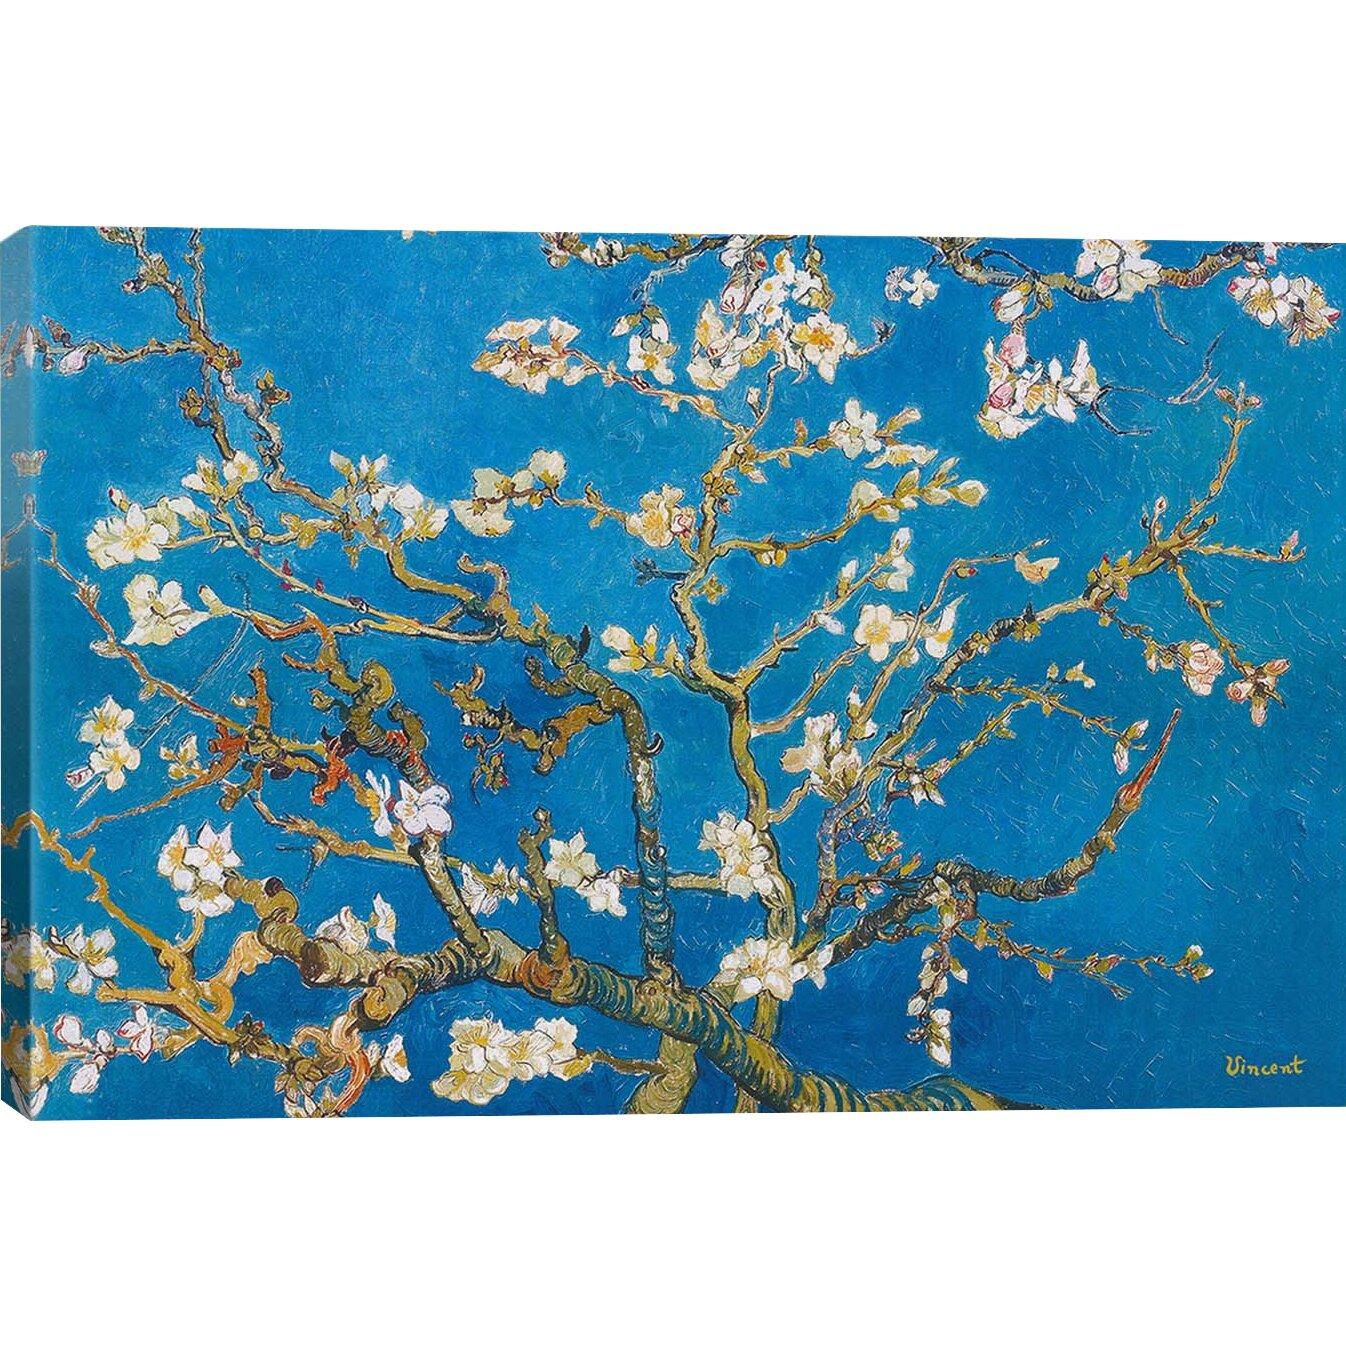 icanvas almond blossom by vincent van gogh painting print on canvas reviews wayfair. Black Bedroom Furniture Sets. Home Design Ideas